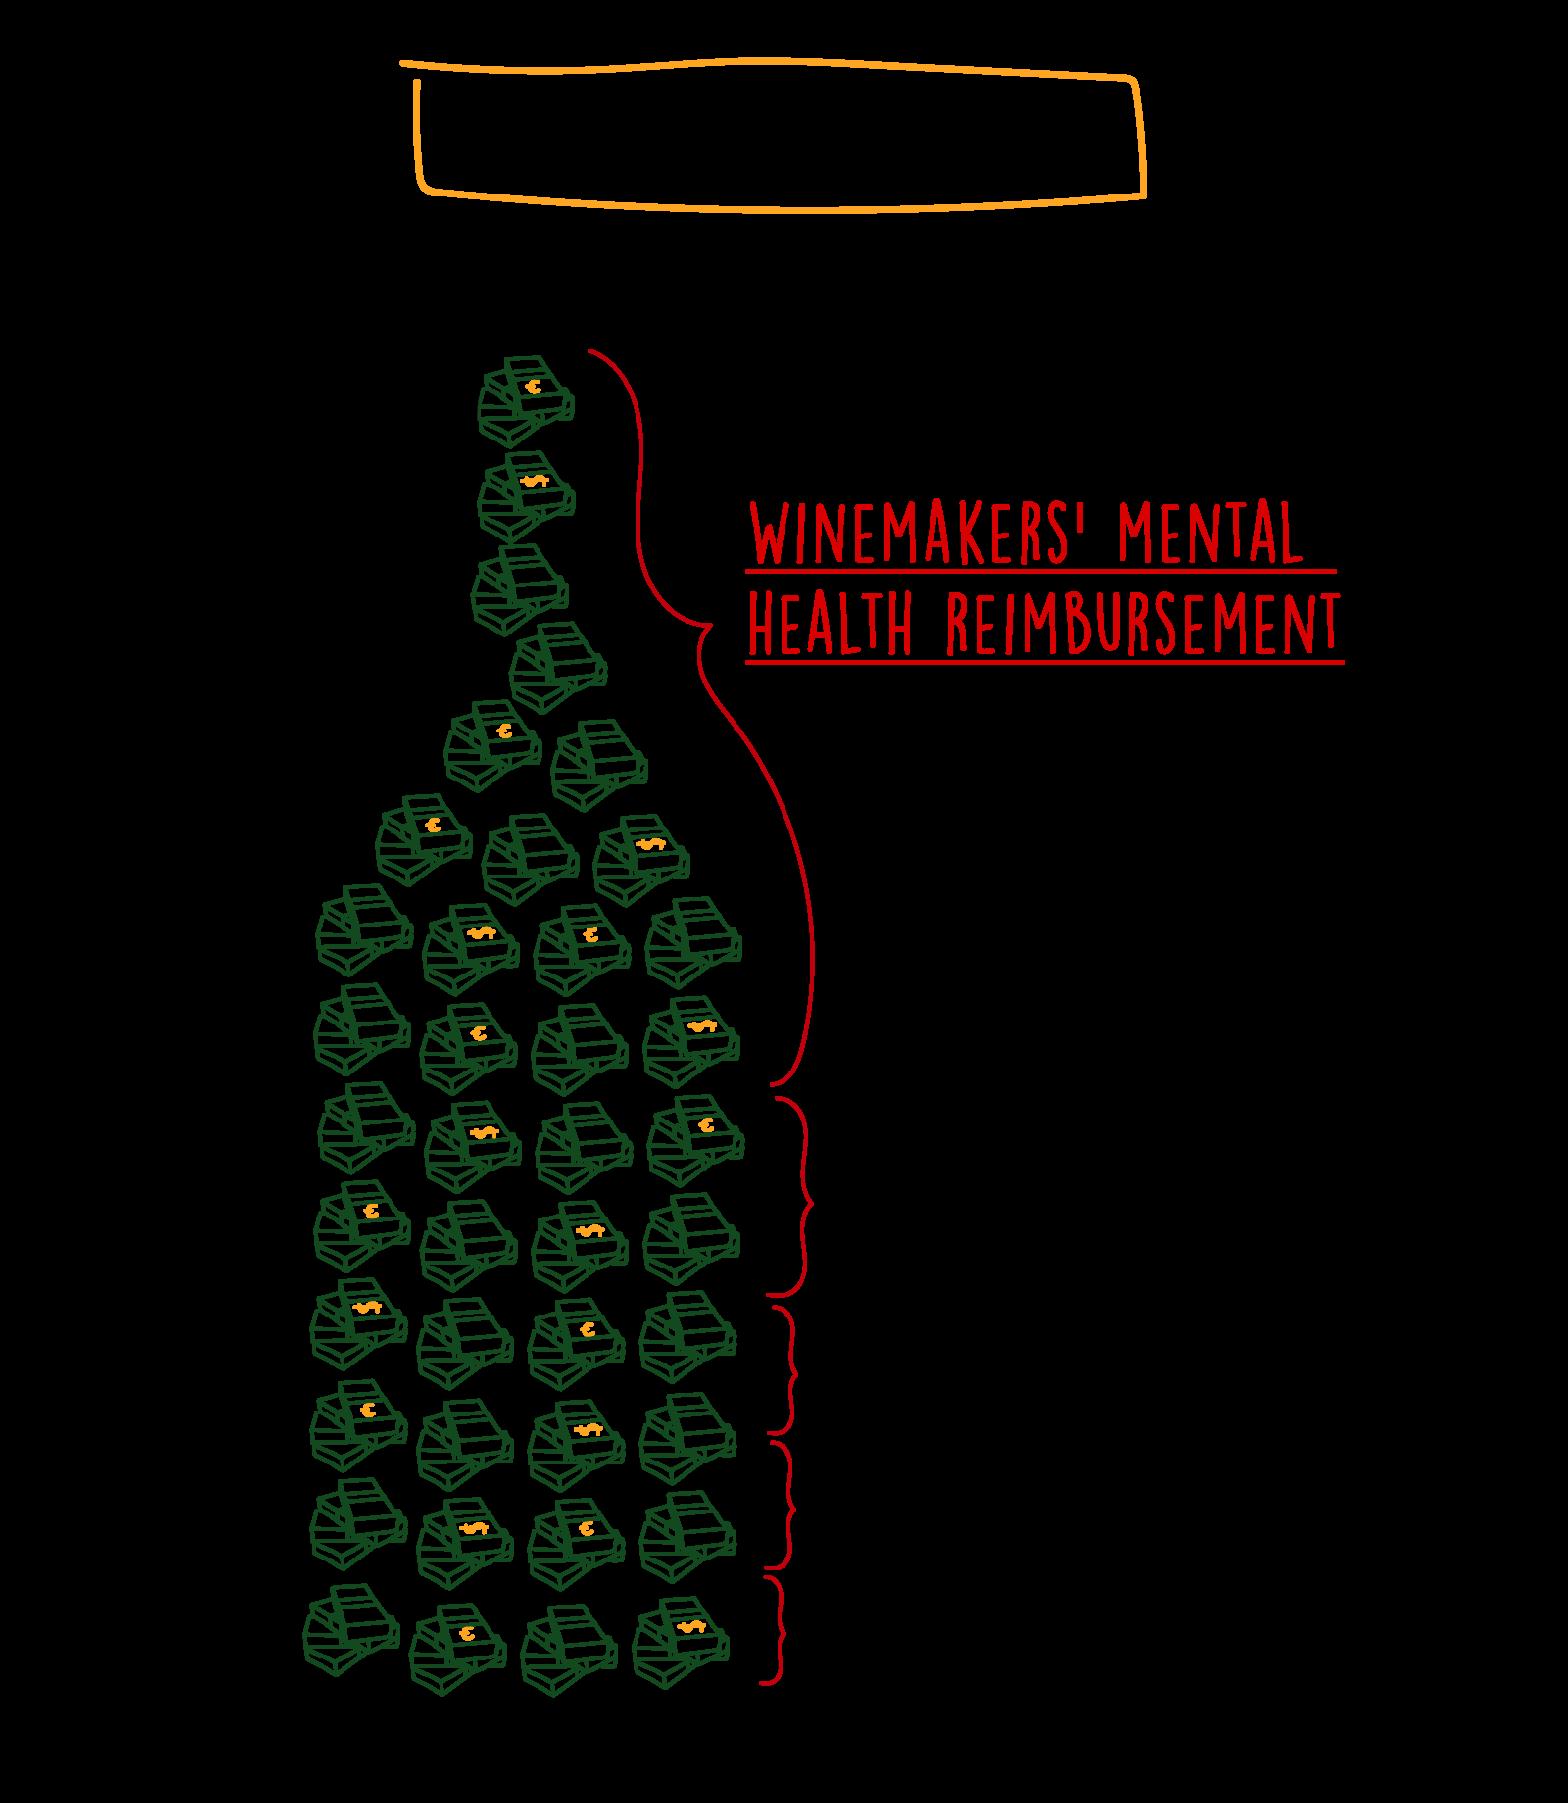 The dark side of Winemaking